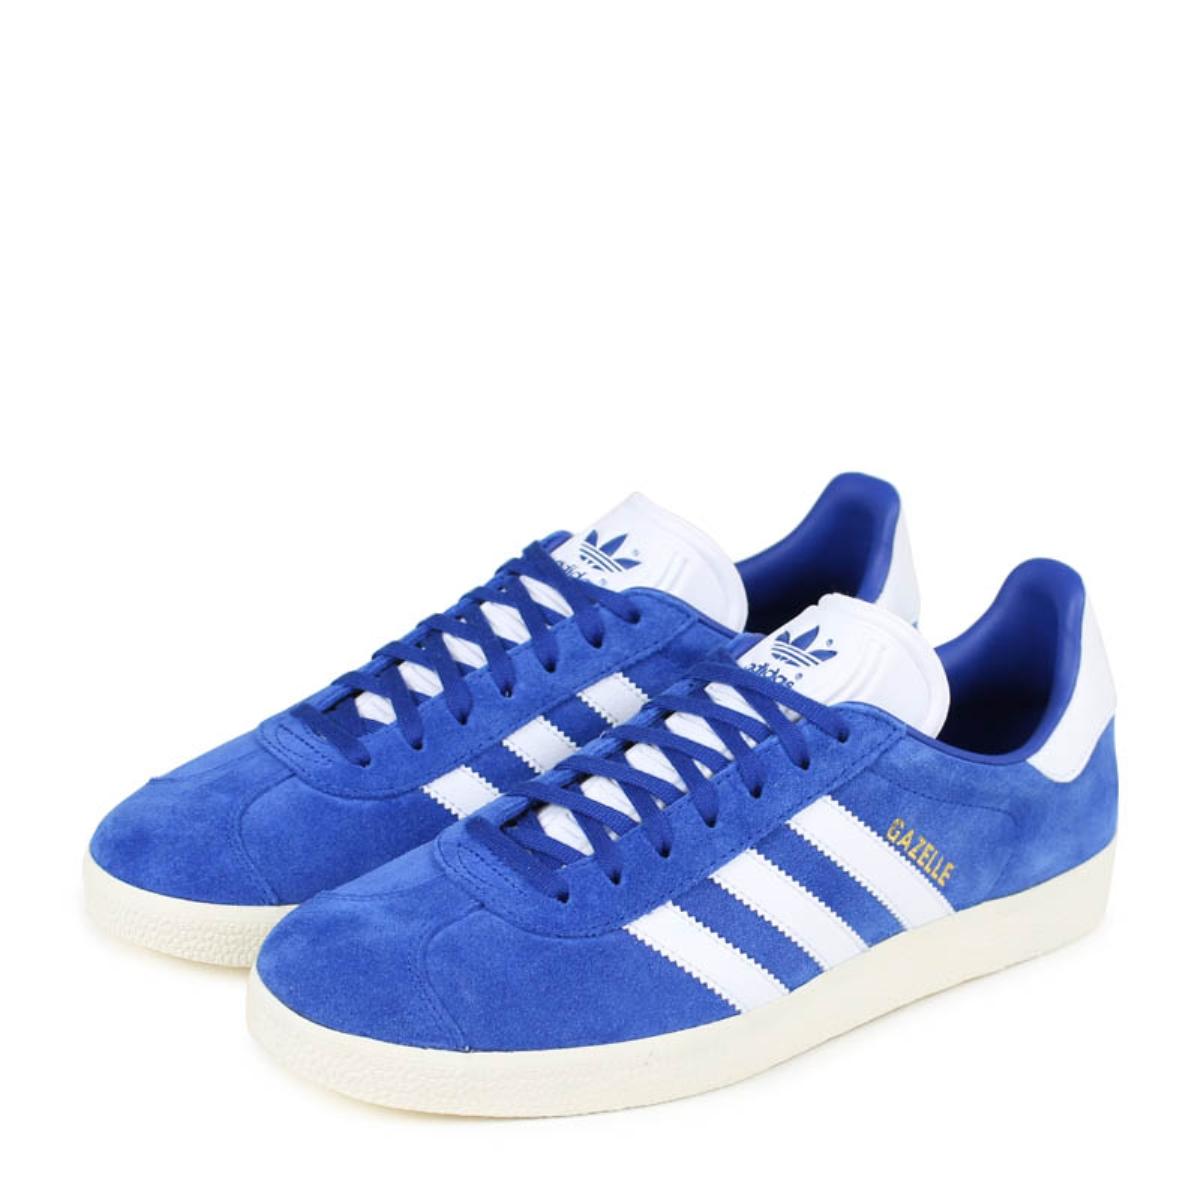 adidas originals GAZELLE ガゼルアディダススニーカーガッツレーメンズ CQ2800 blue originals [load planned Shinnyu load in reservation product 116 containing]